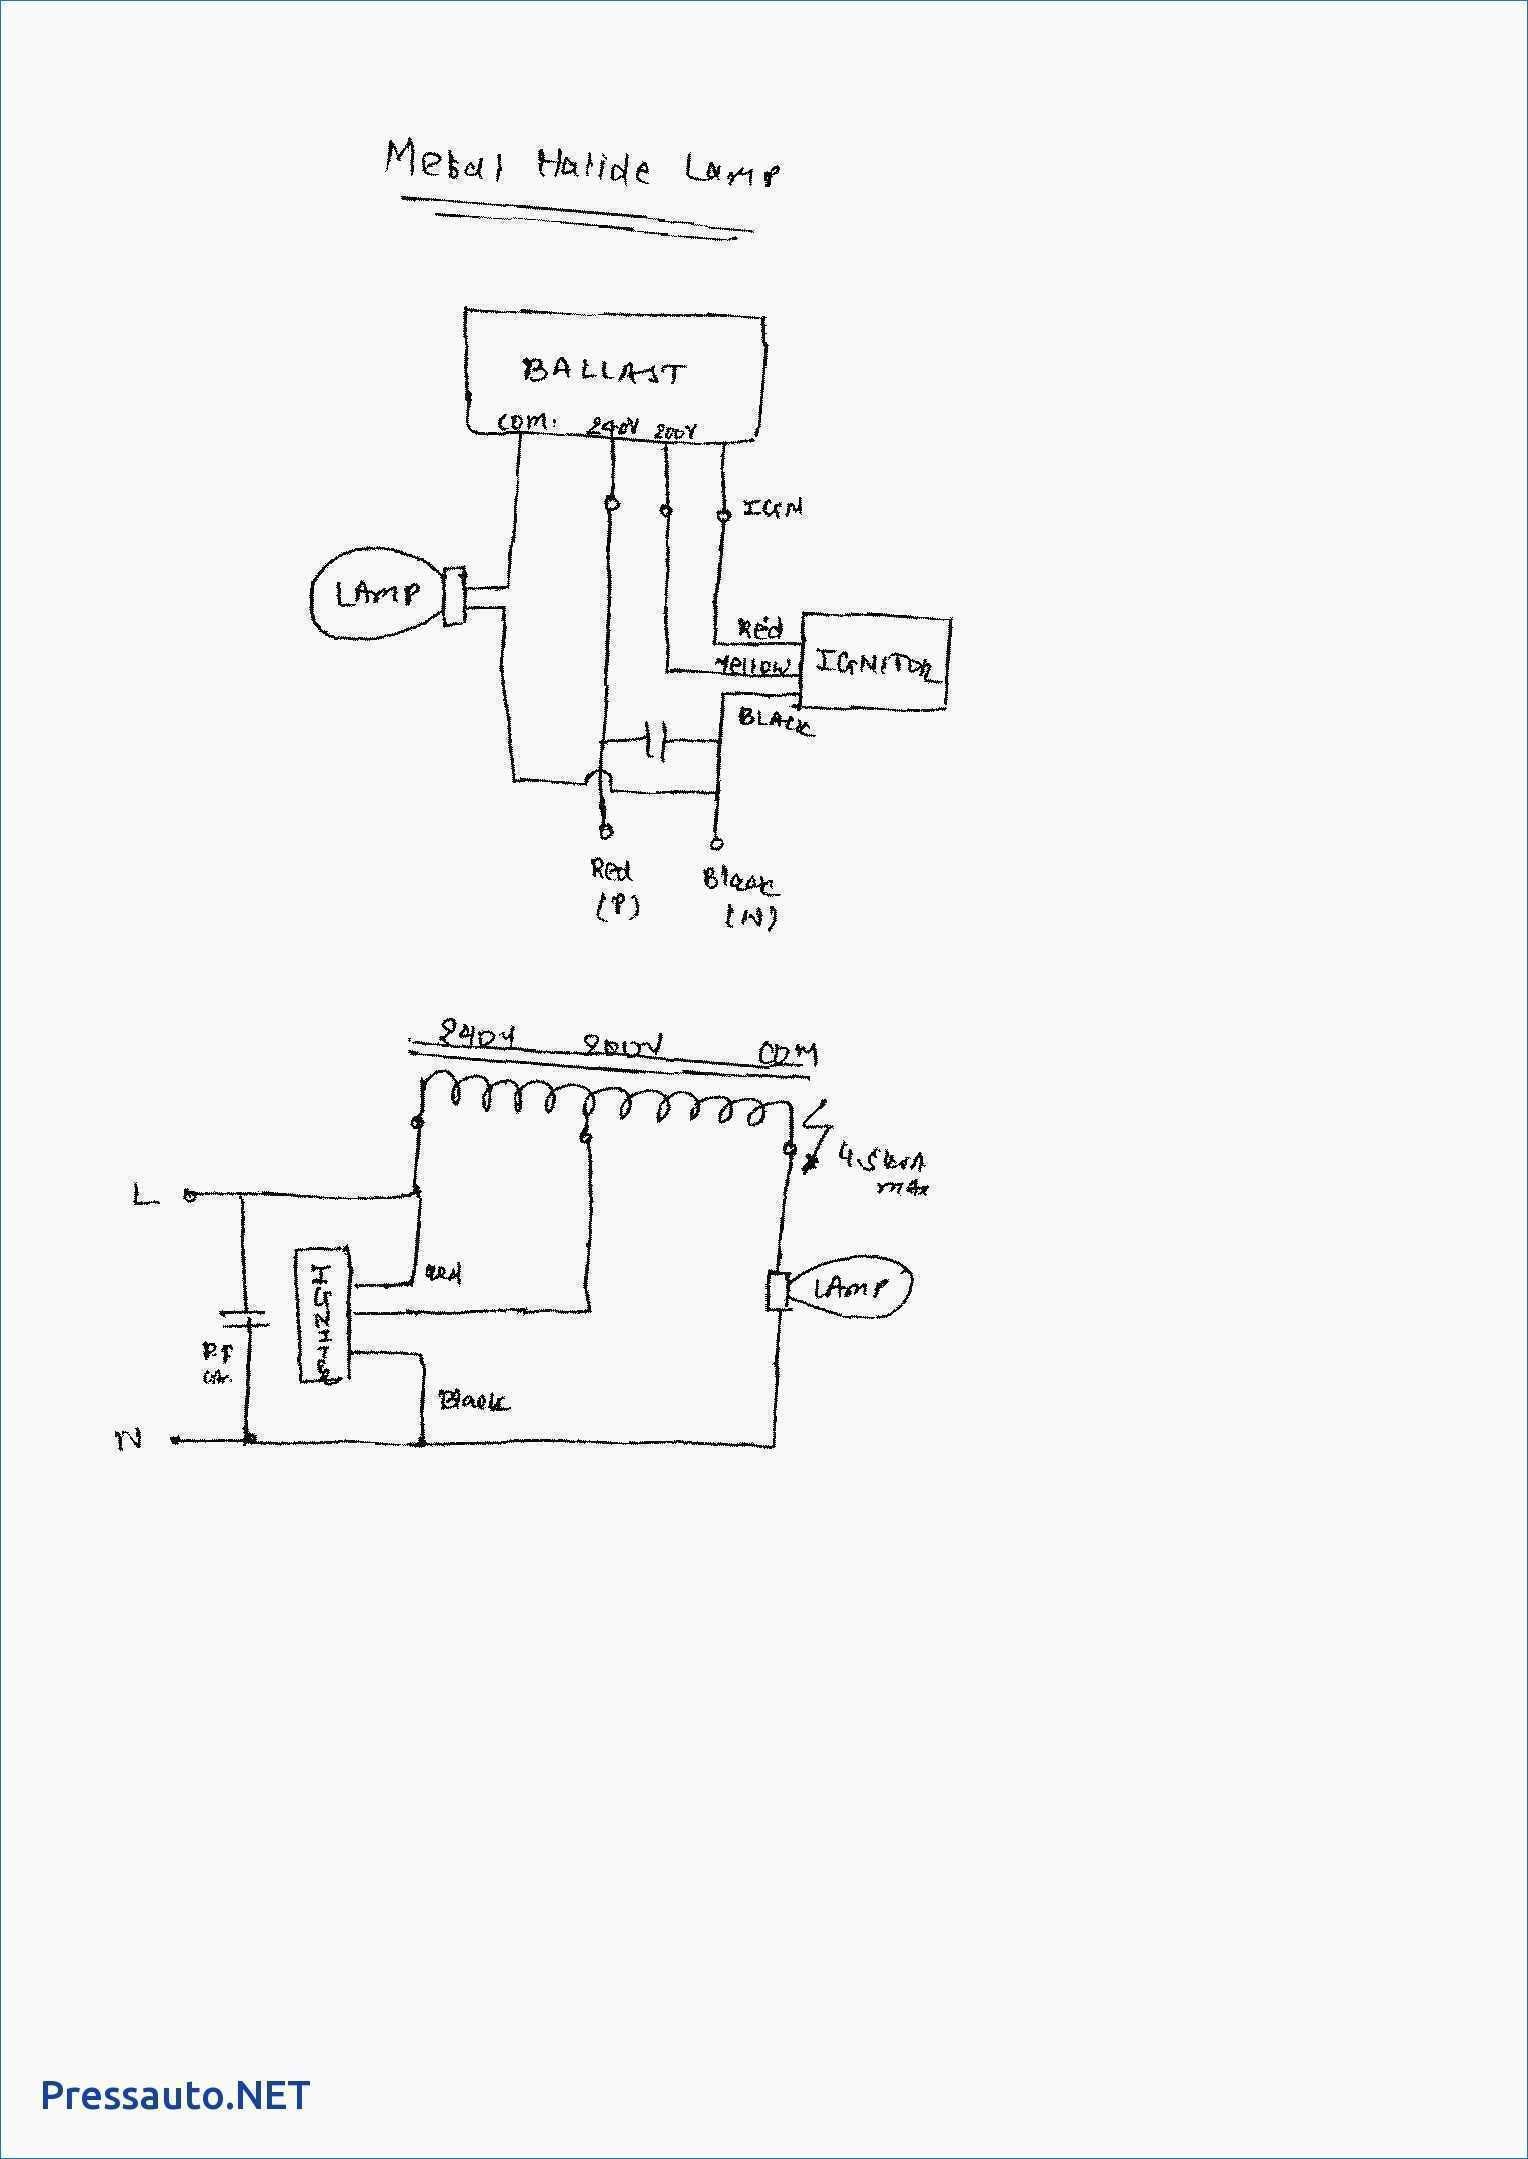 YR_5345] 1000W Sodium Ballast Wiring Diagram Wiring DiagramChro Kook Caba Vira Birdem Inama Mohammedshrine Librar Wiring 101